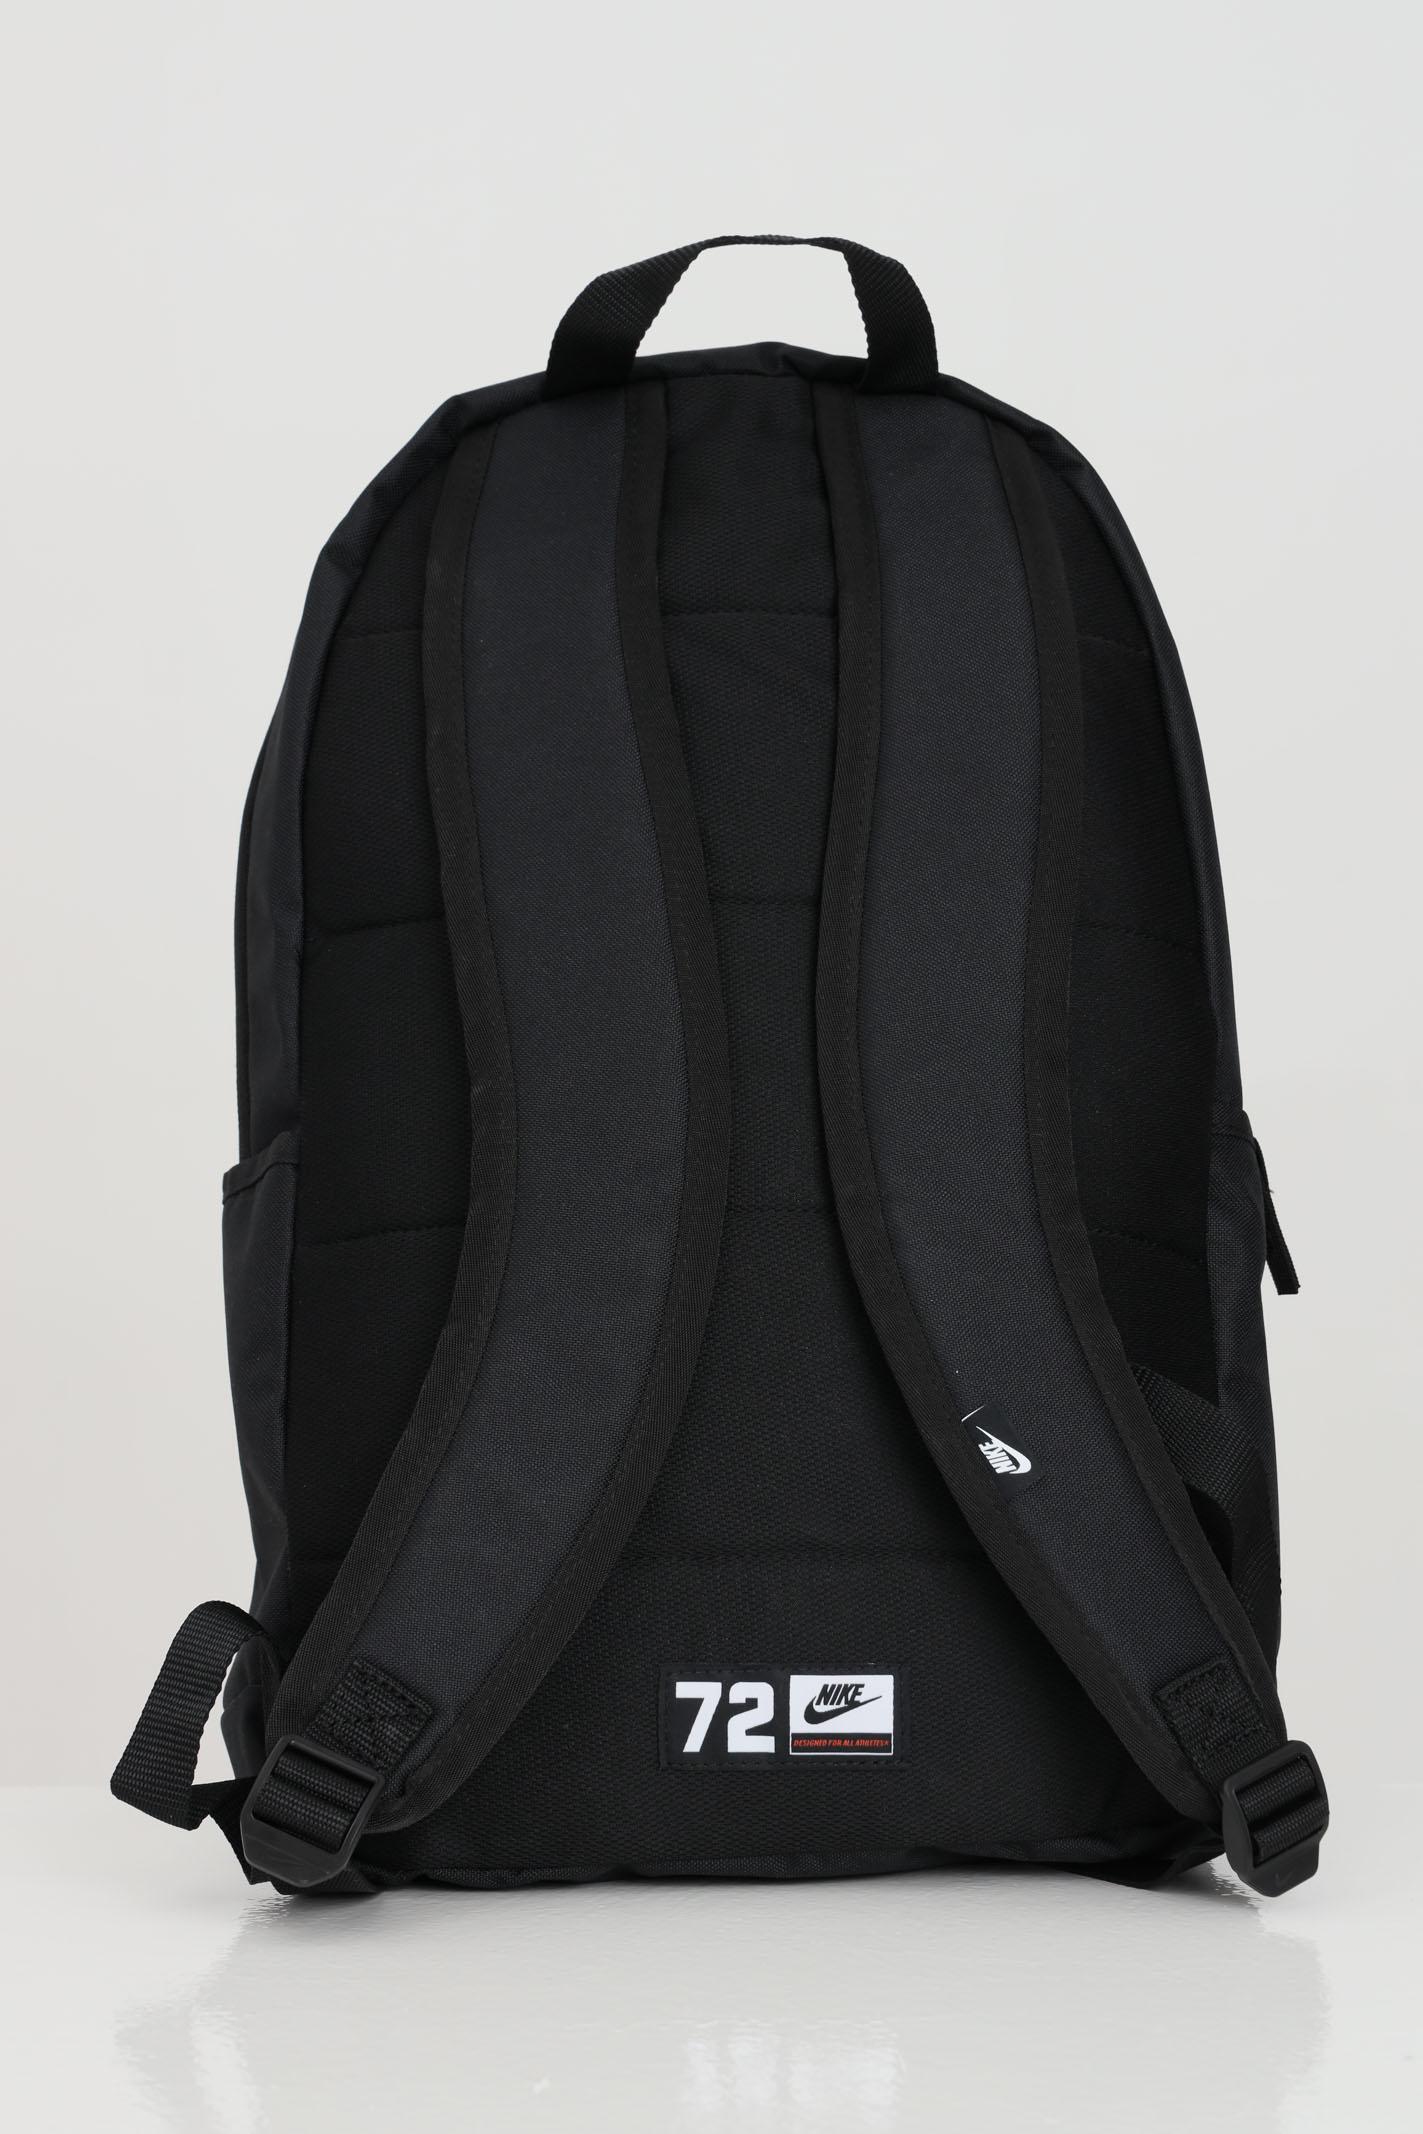 Zaino sportswear in tinta unita con tracolle regolabili NIKE | Zaini | BA5876082